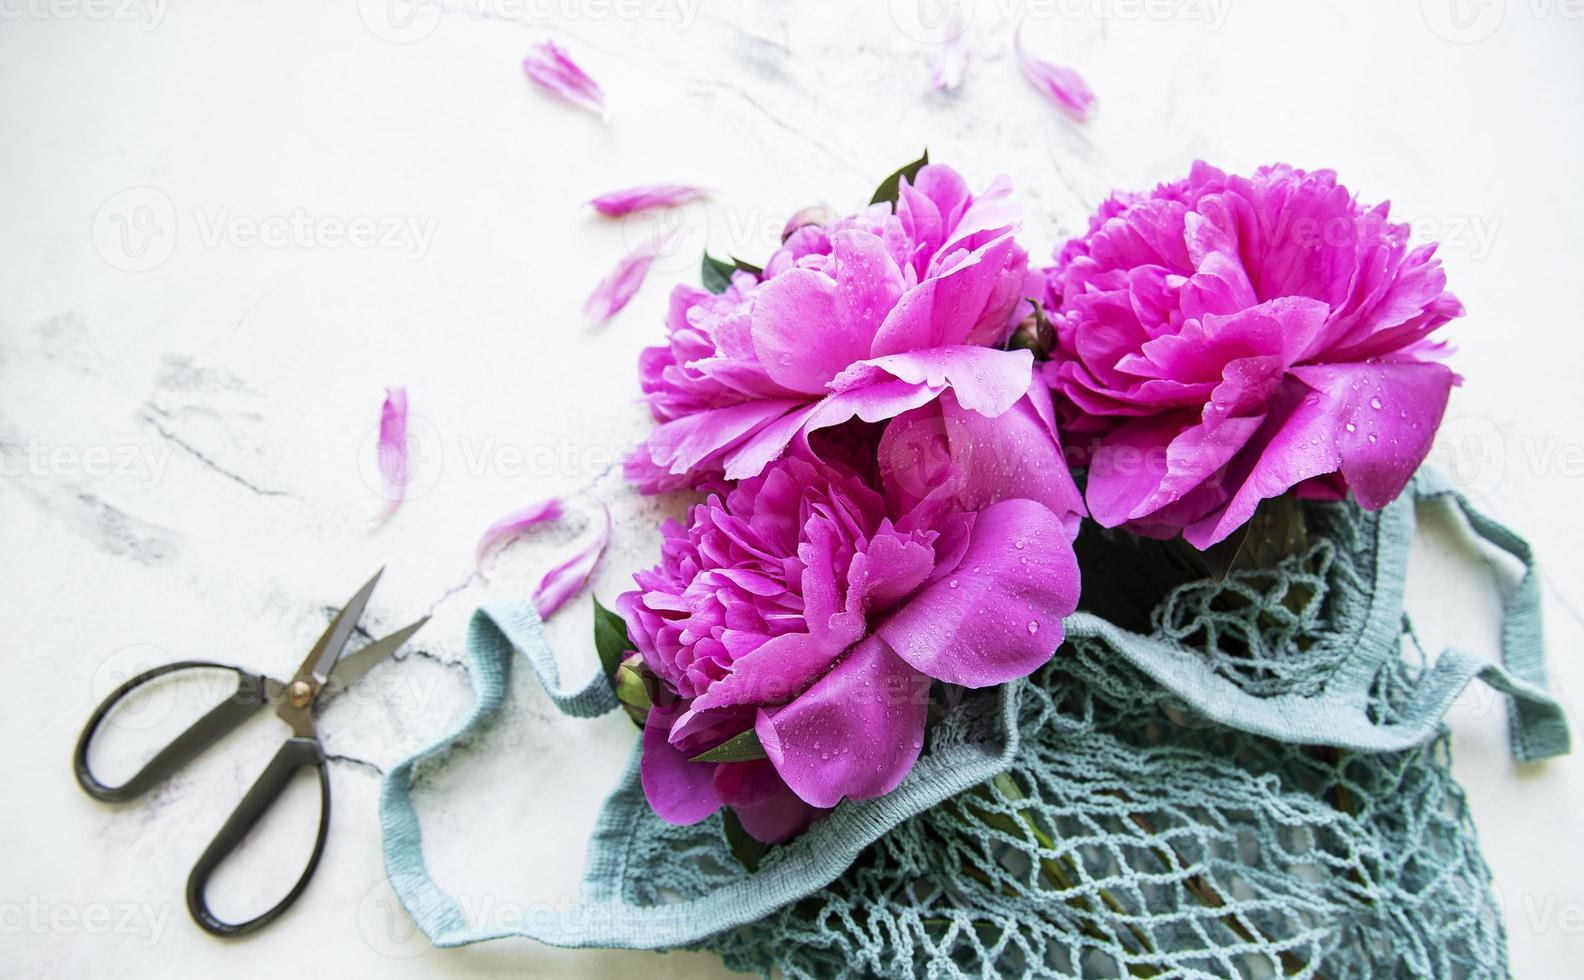 flores de peonía rosa en bolsa de hilo foto